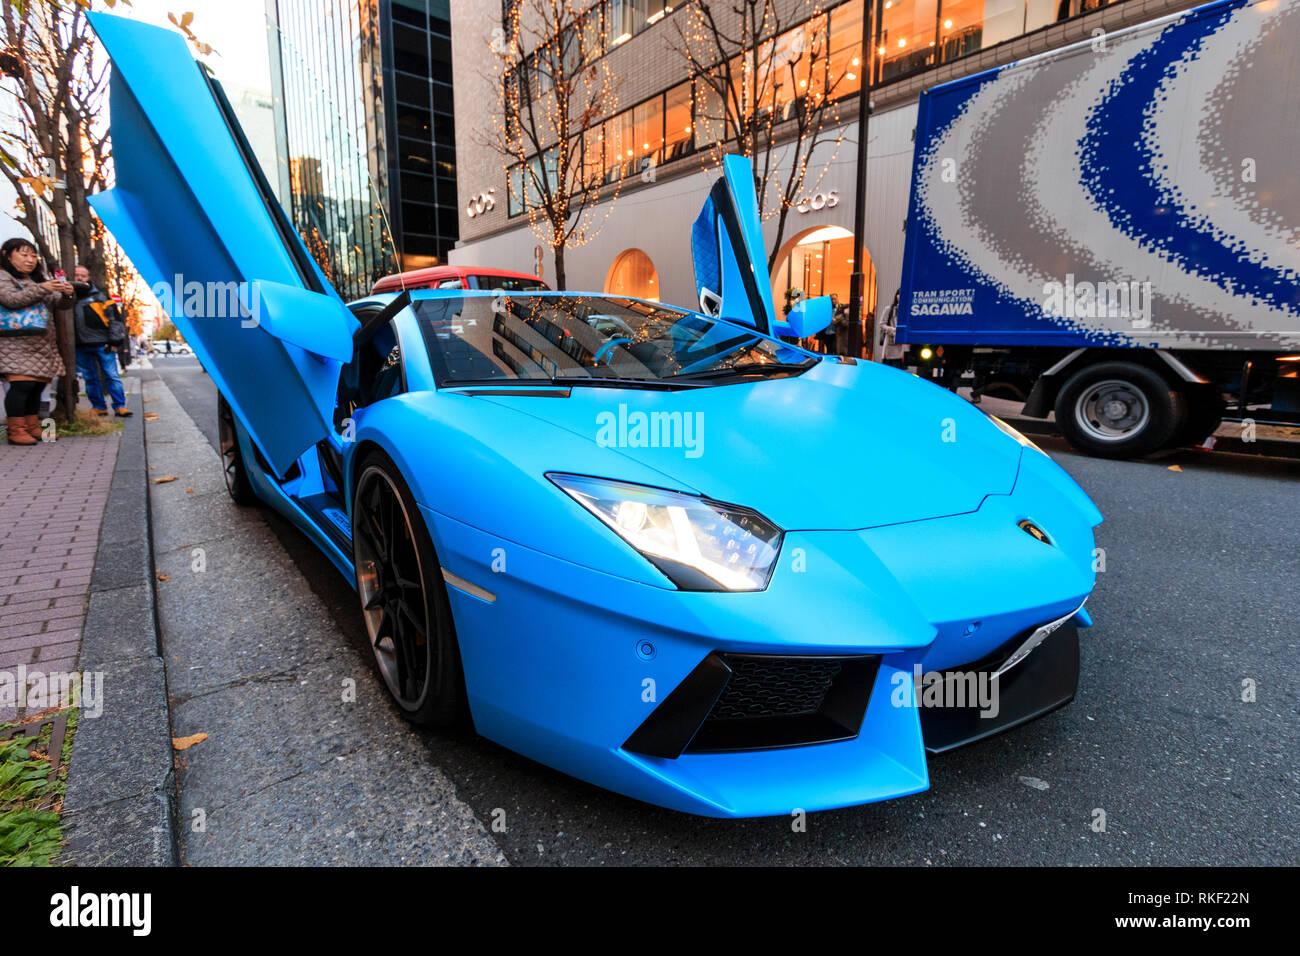 Light Blue Lamborghini Aventador Roadster High Performance Super